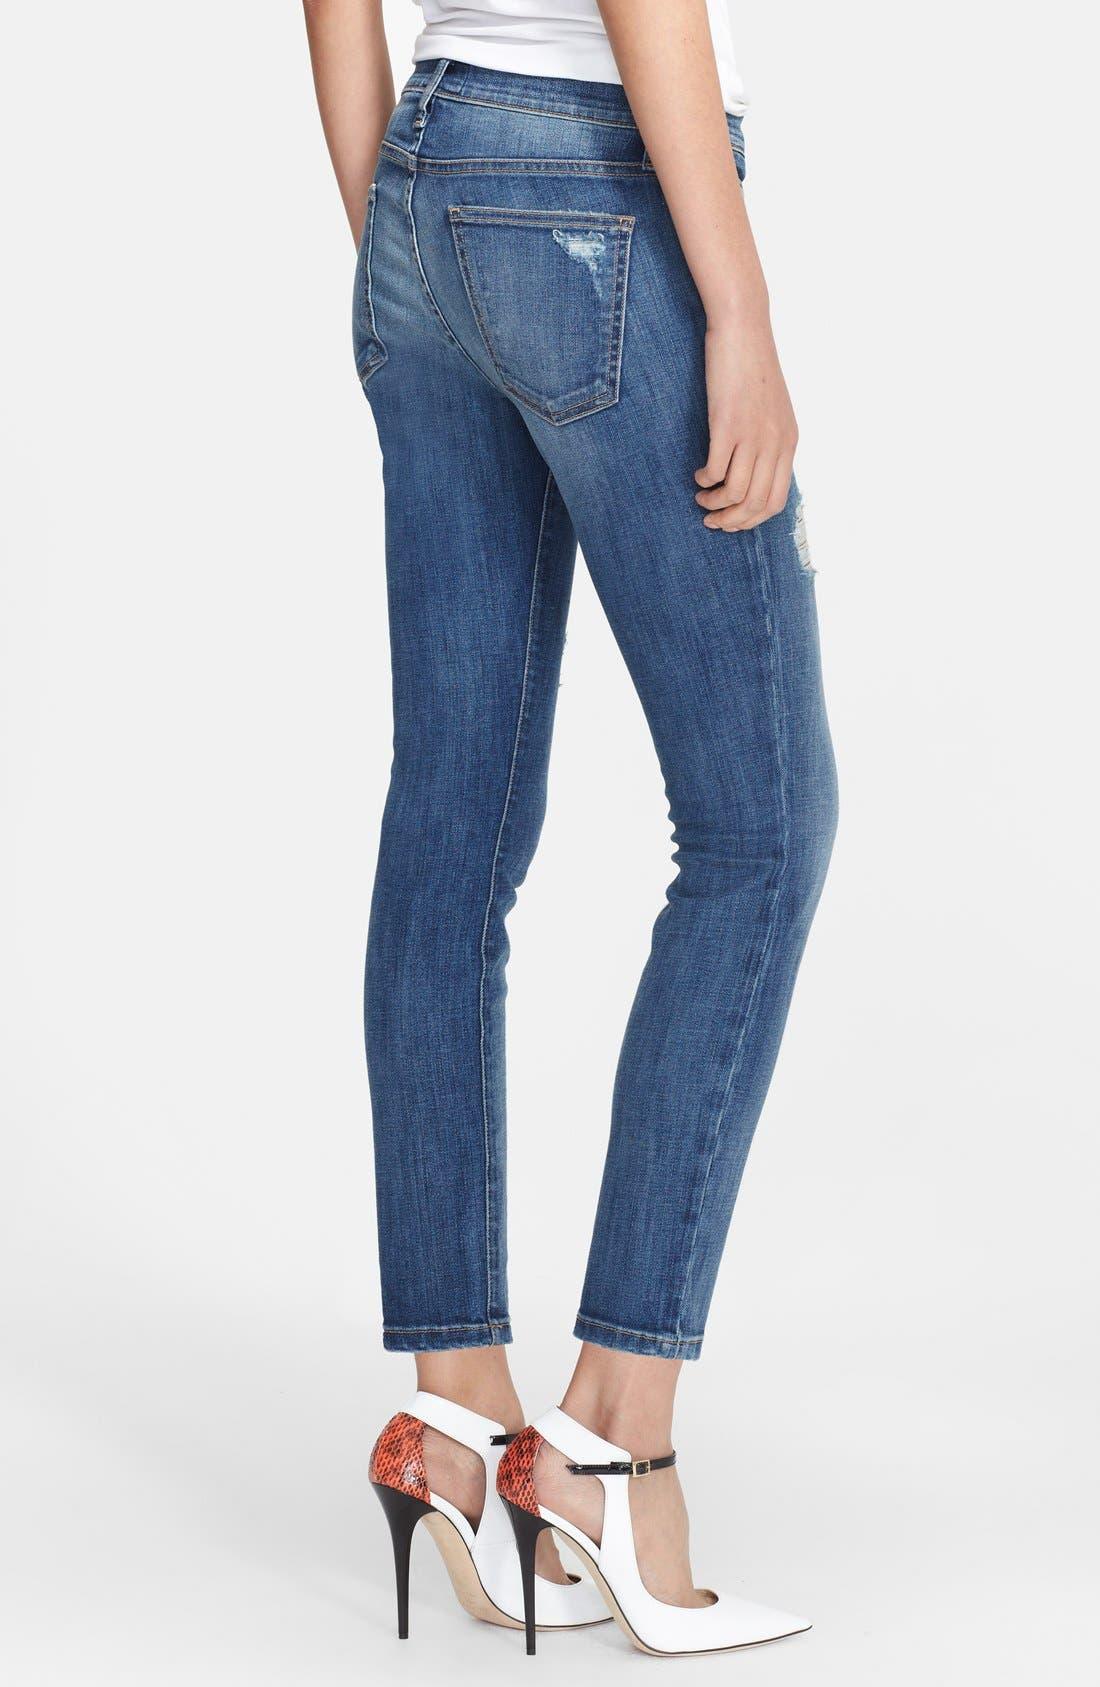 CURRENT/ELLIOTT,                             'The Stiletto' Destroyed Skinny Jeans,                             Alternate thumbnail 3, color,                             475